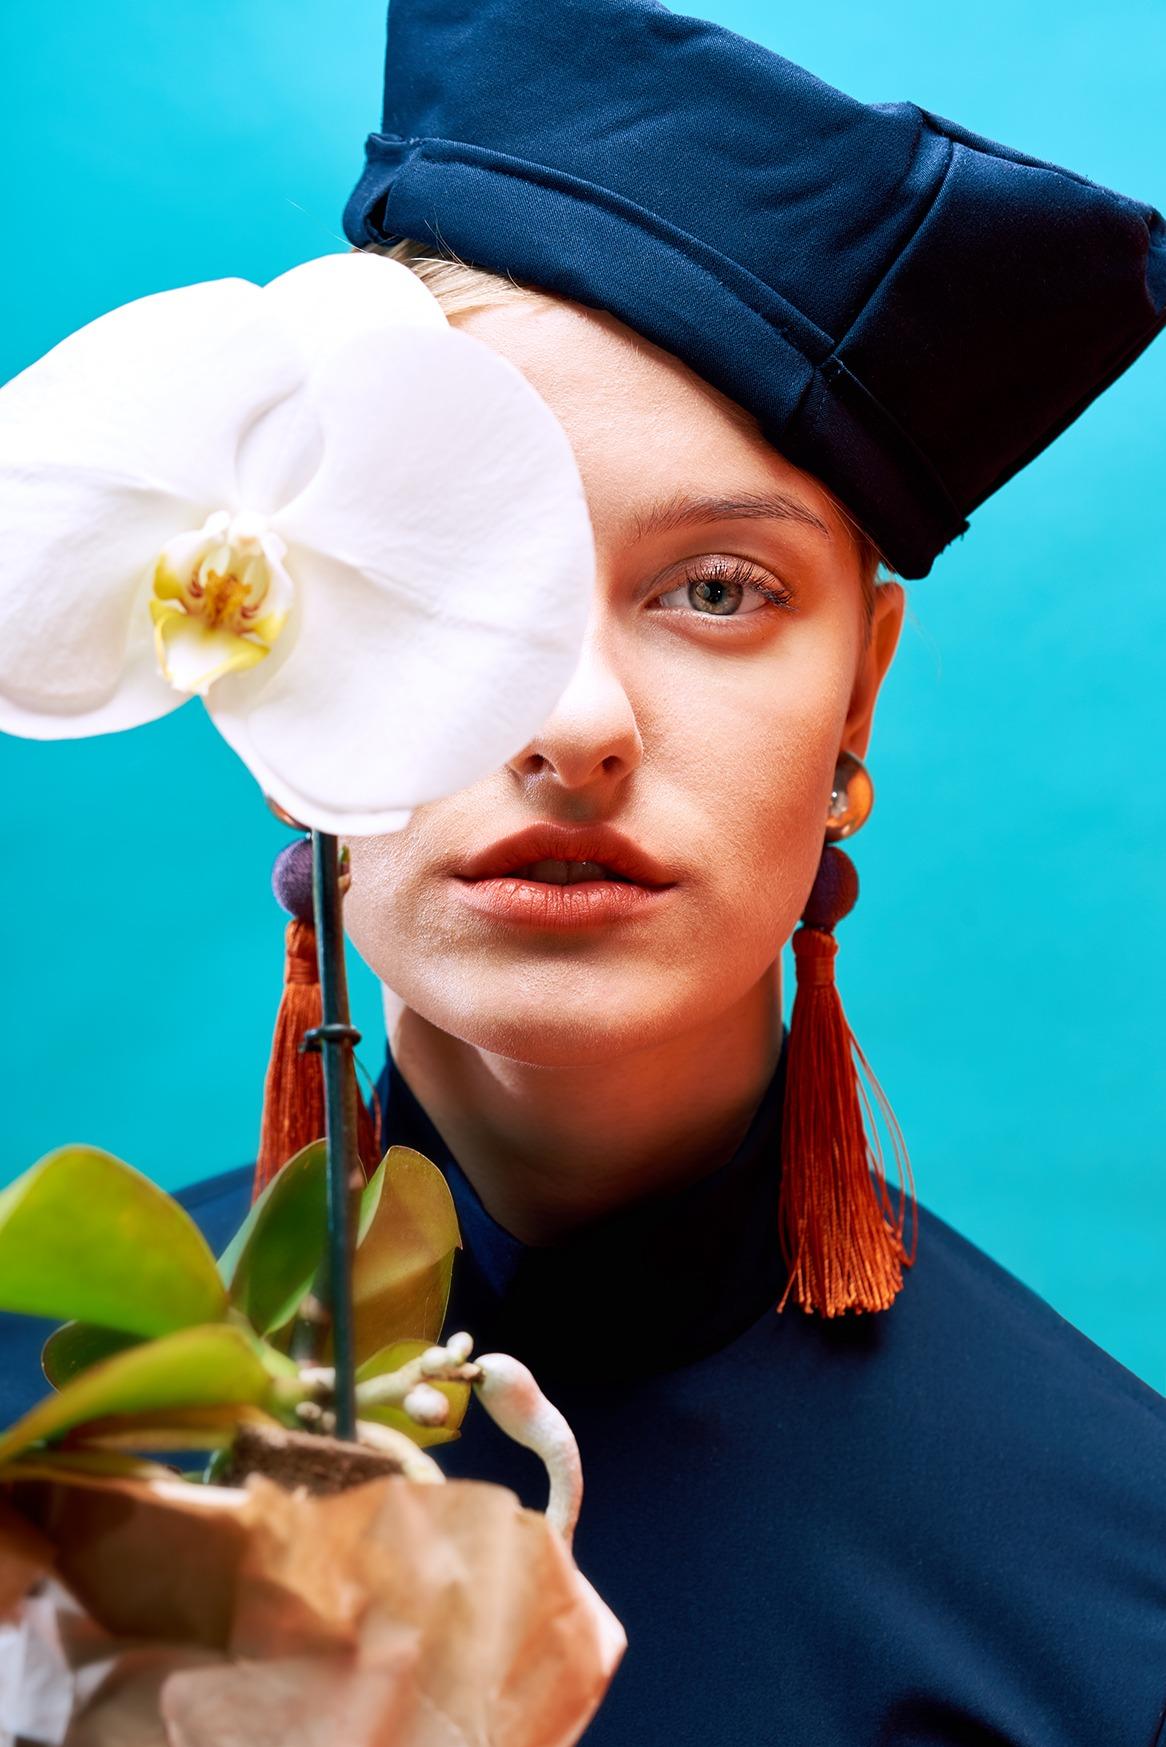 Modefotografie straubmuellerstudios Stuttgart frau blau